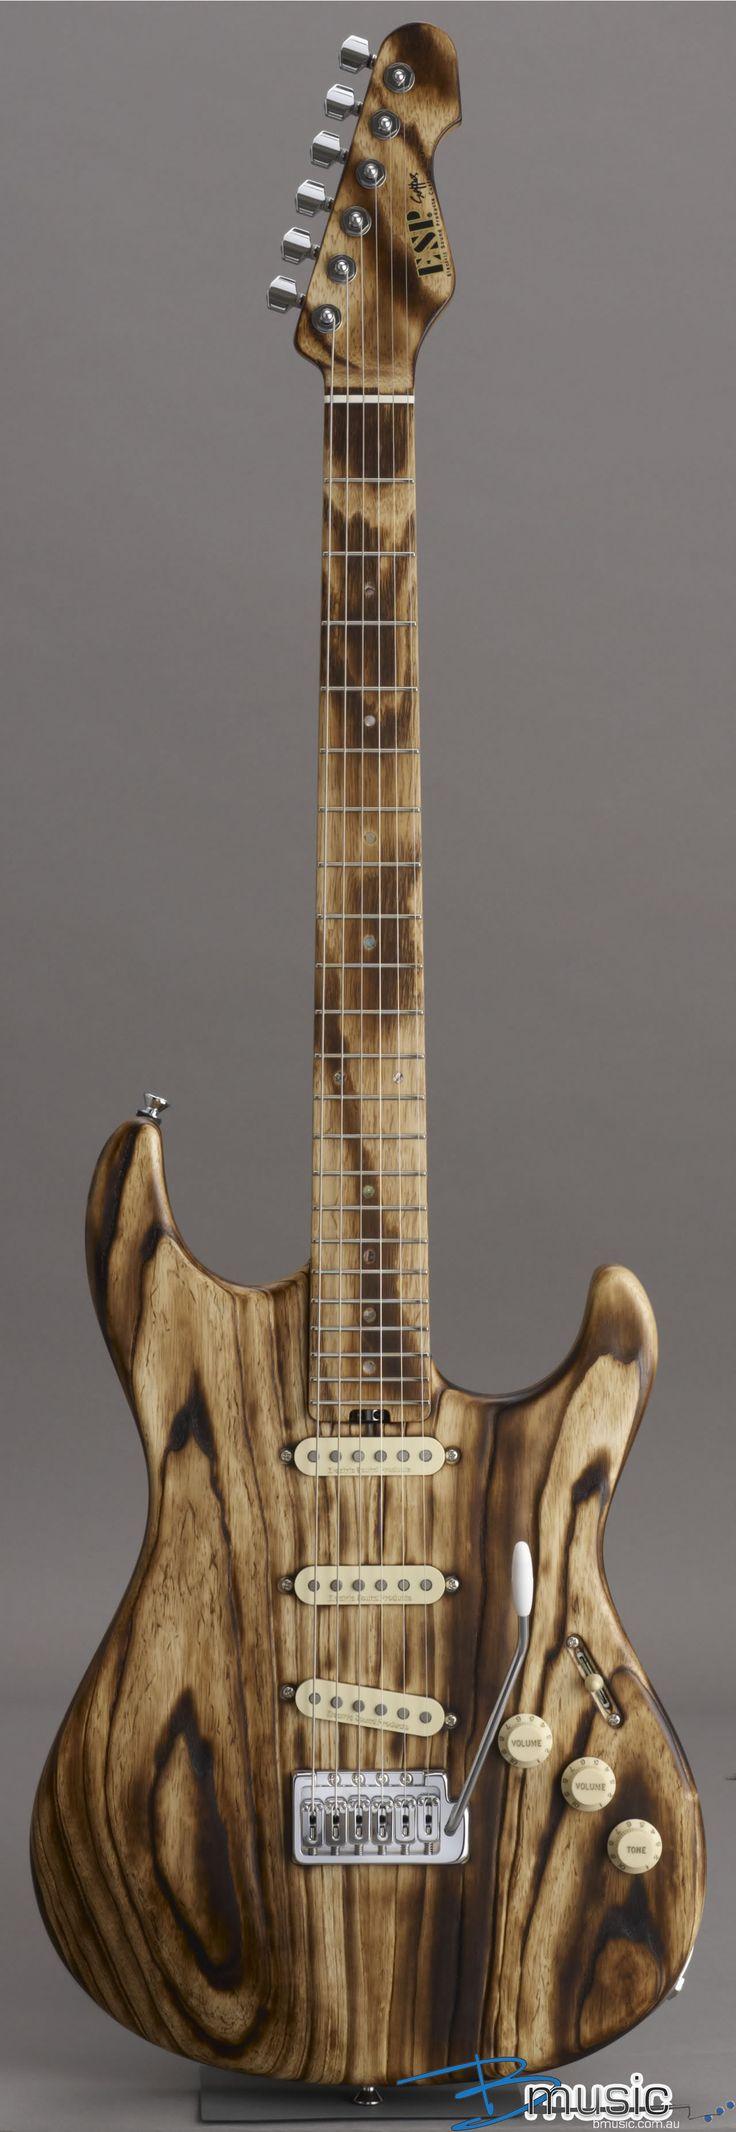 guitarsatbmusic's Bucket